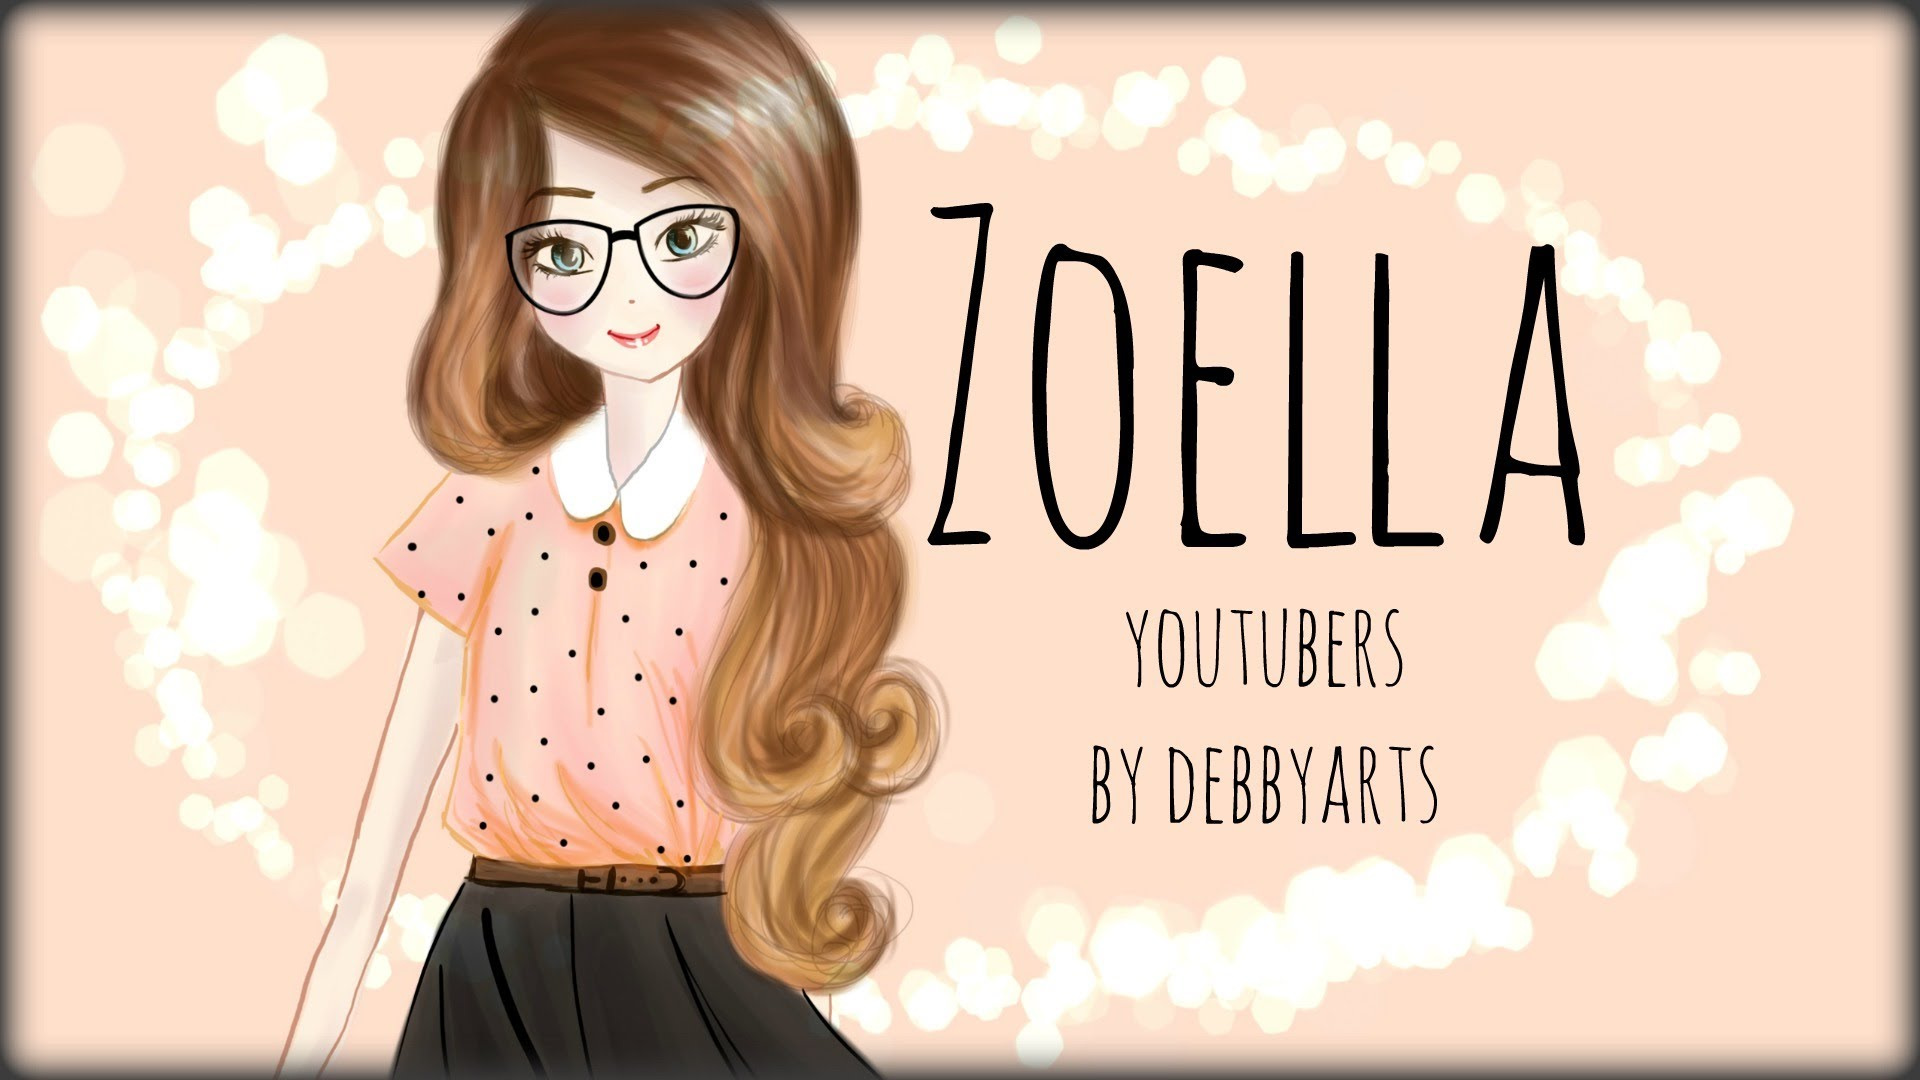 Drawn starbucks zoella ~DebbyArts YouTube by Zoella